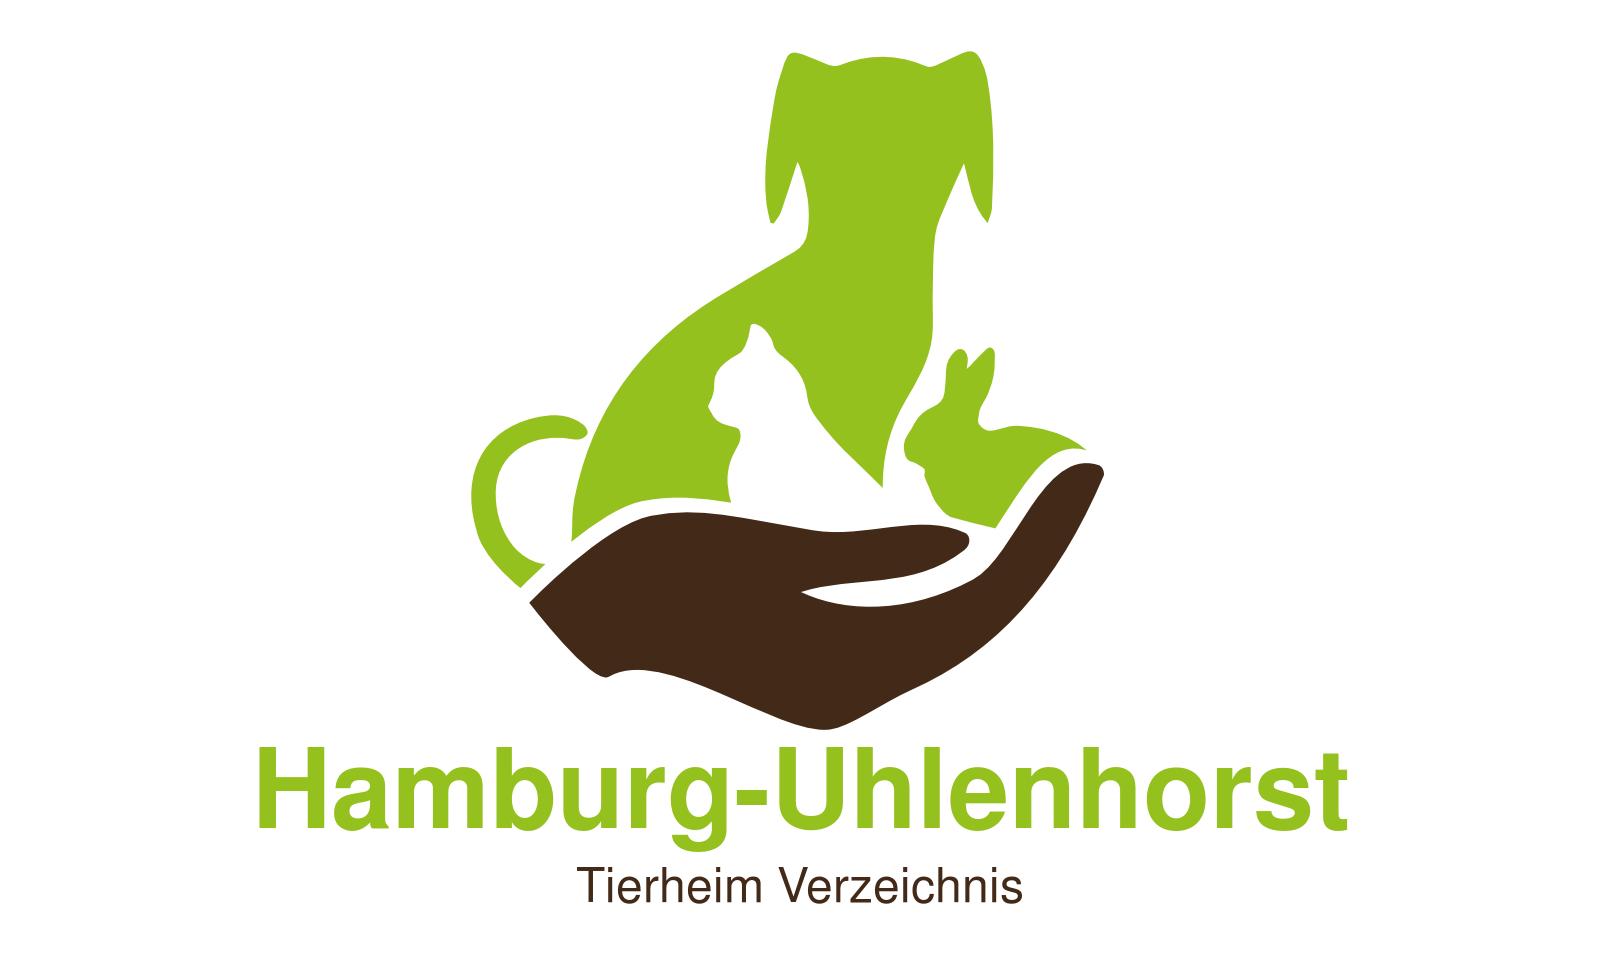 Tierheim Hamburg Uhlenhorst